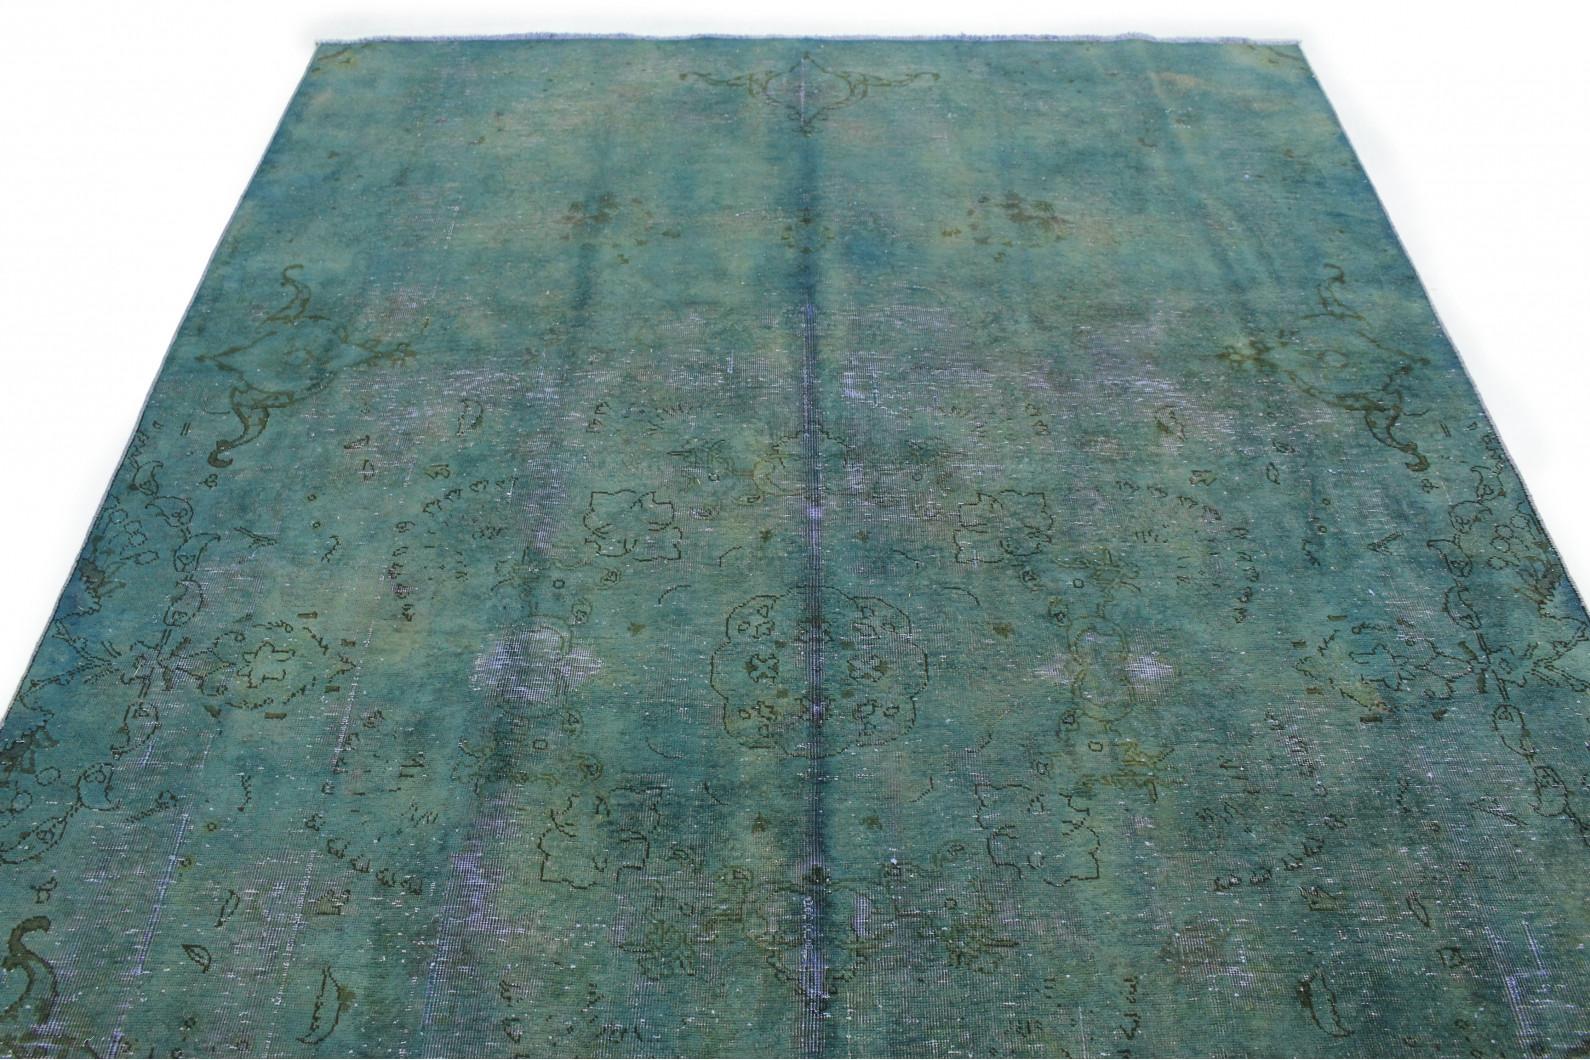 vintage teppich t rkis in 310x200 1001 177247 bei. Black Bedroom Furniture Sets. Home Design Ideas